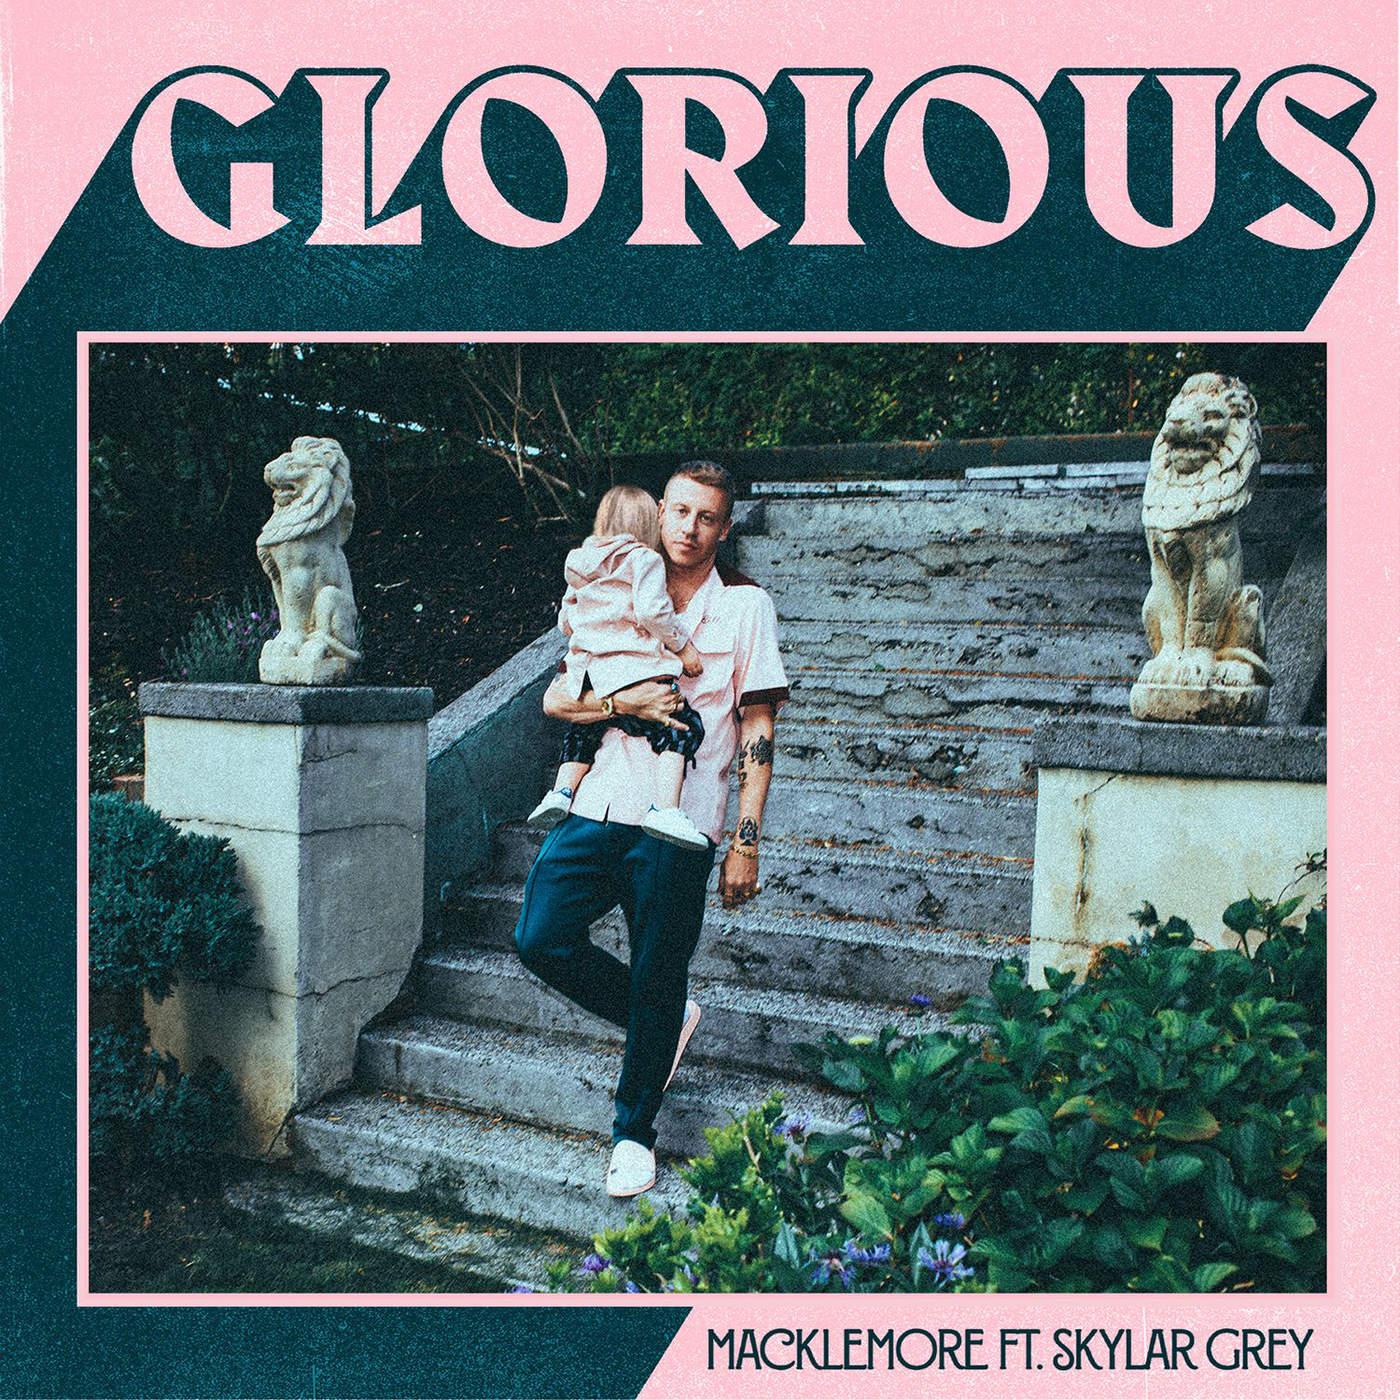 Macklemore - Glorious (feat. Skylar Grey) - Single Cover